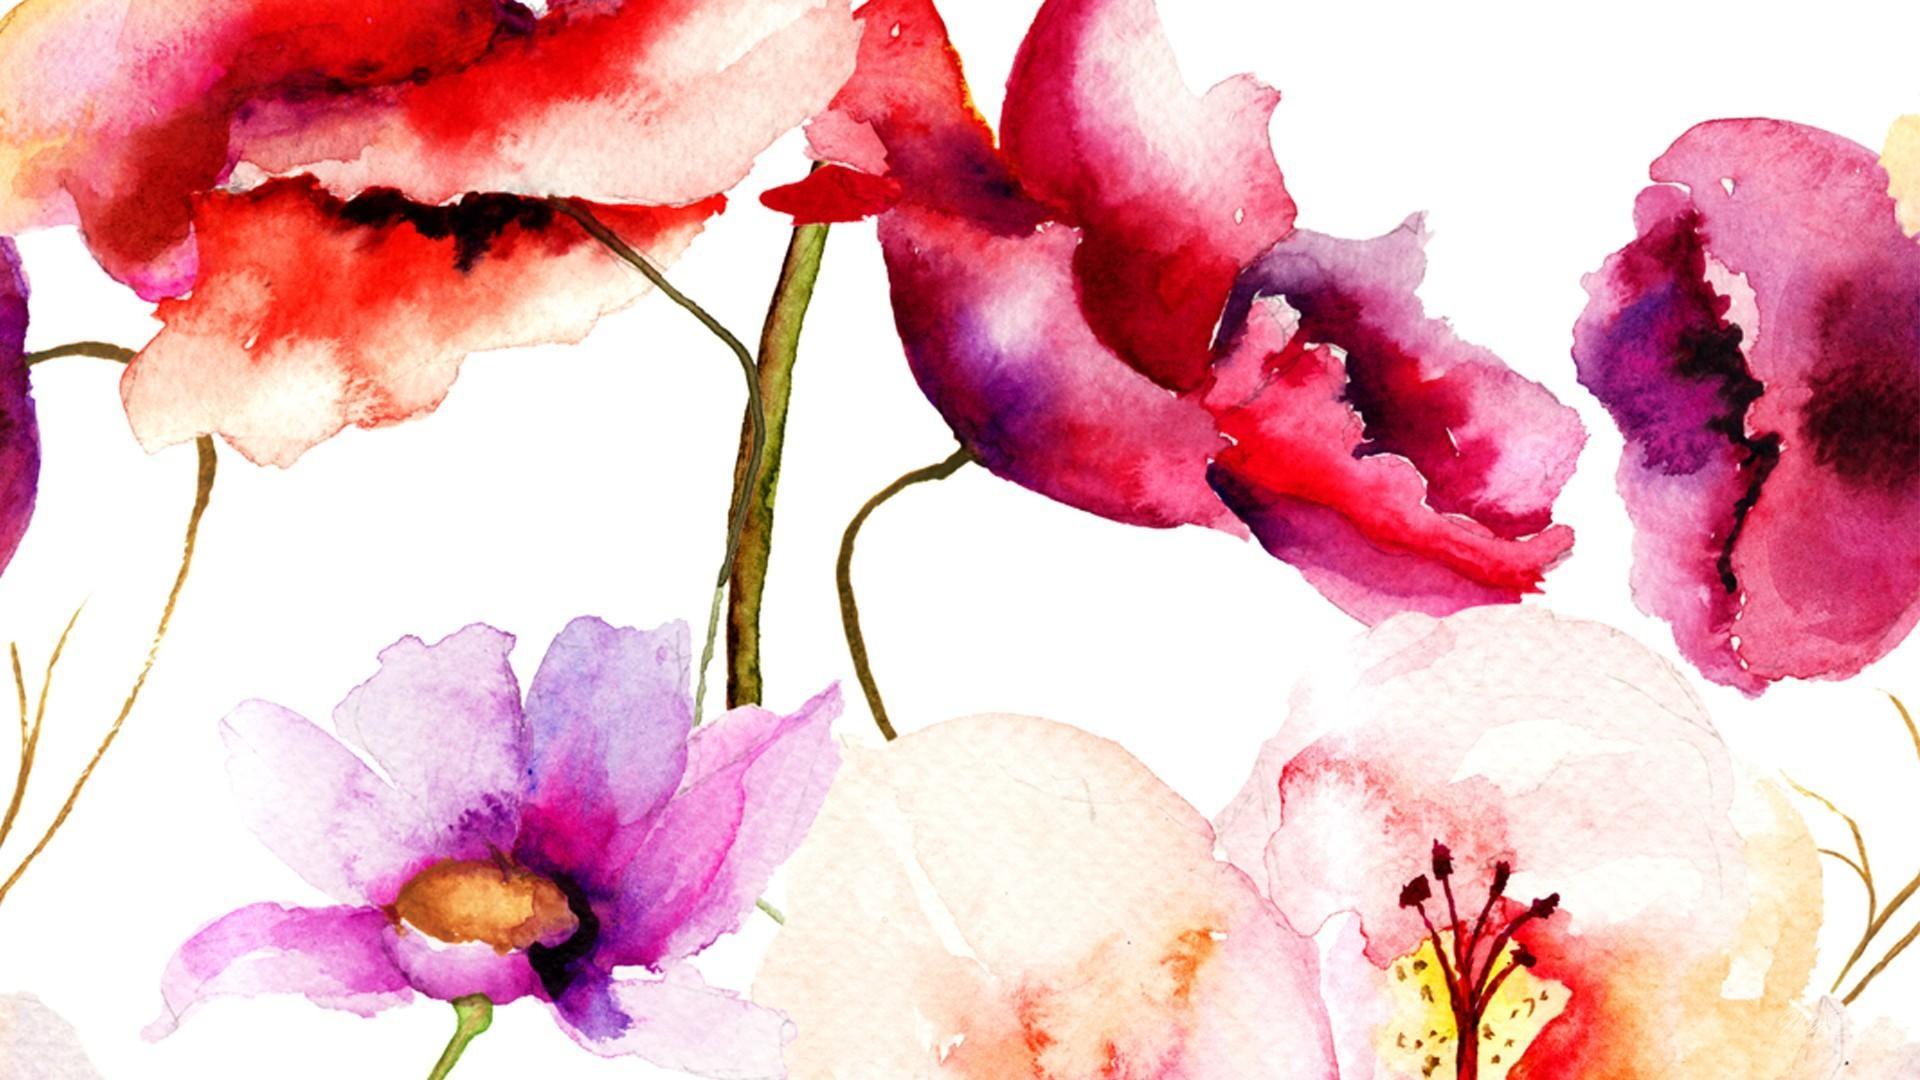 … watercolor wallpaper hd wallpapercraft …